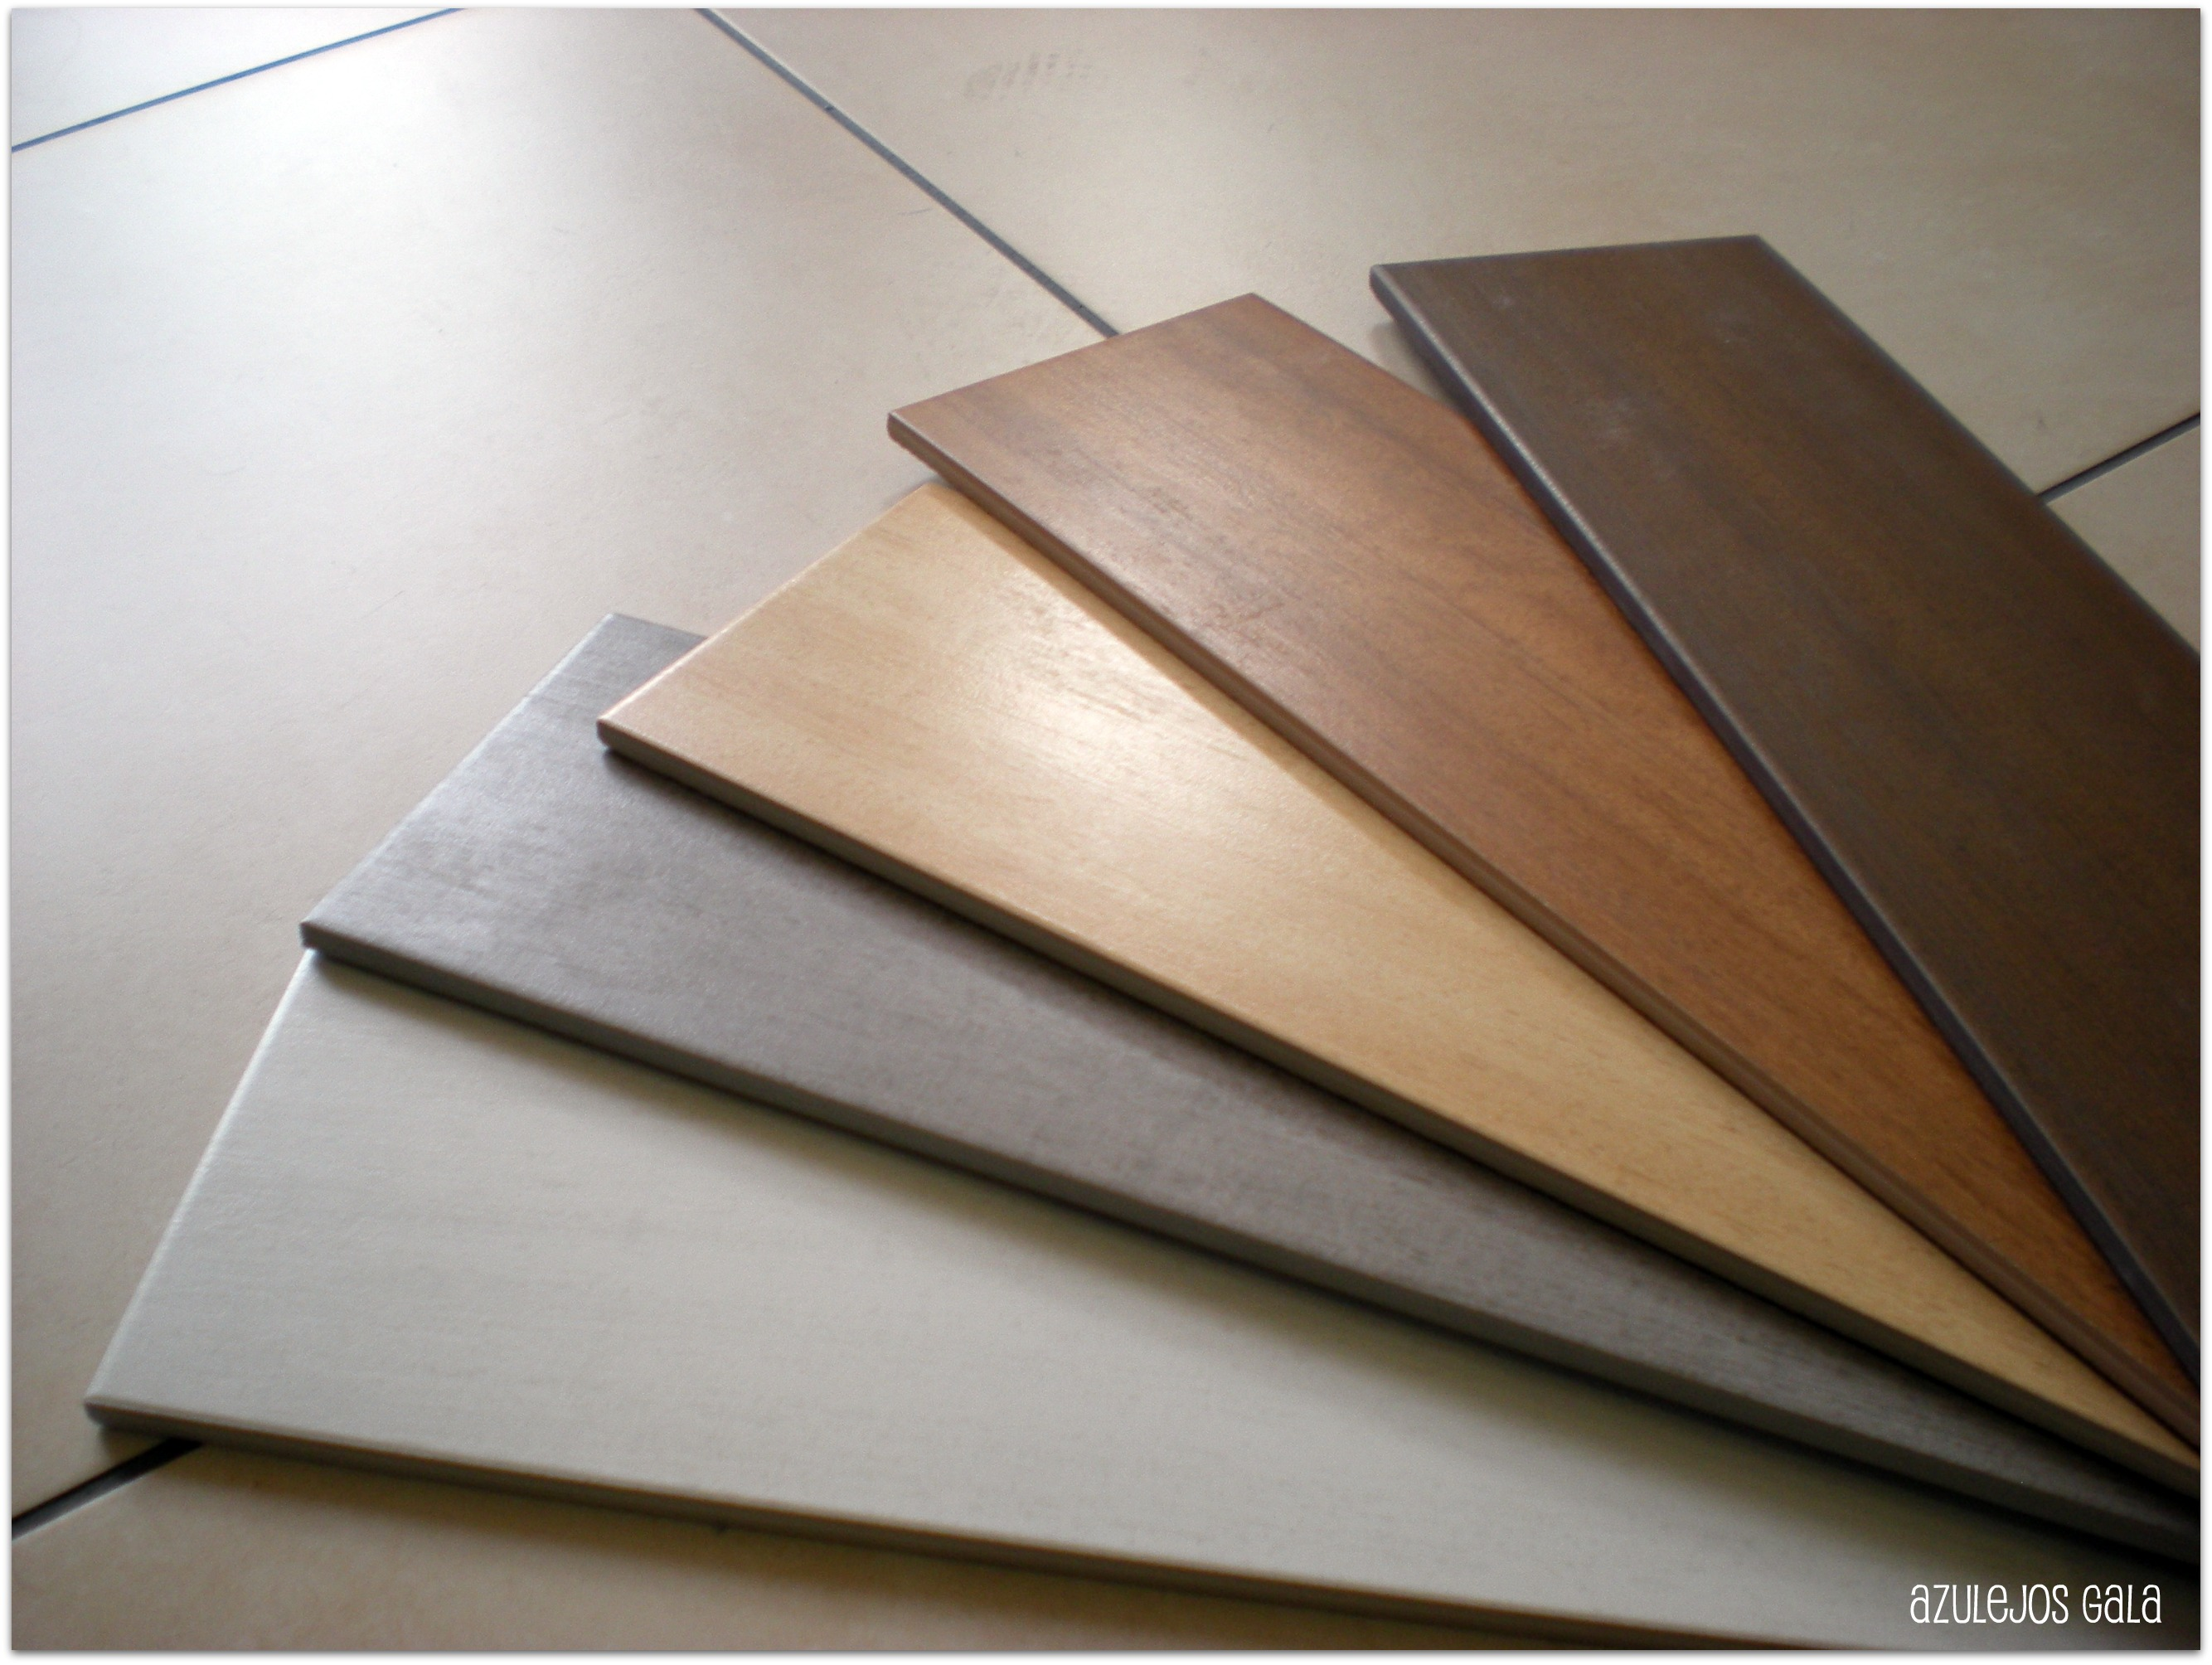 Decoracion mueble sofa suelo exterior imitacion madera for Suelo que simula parquet